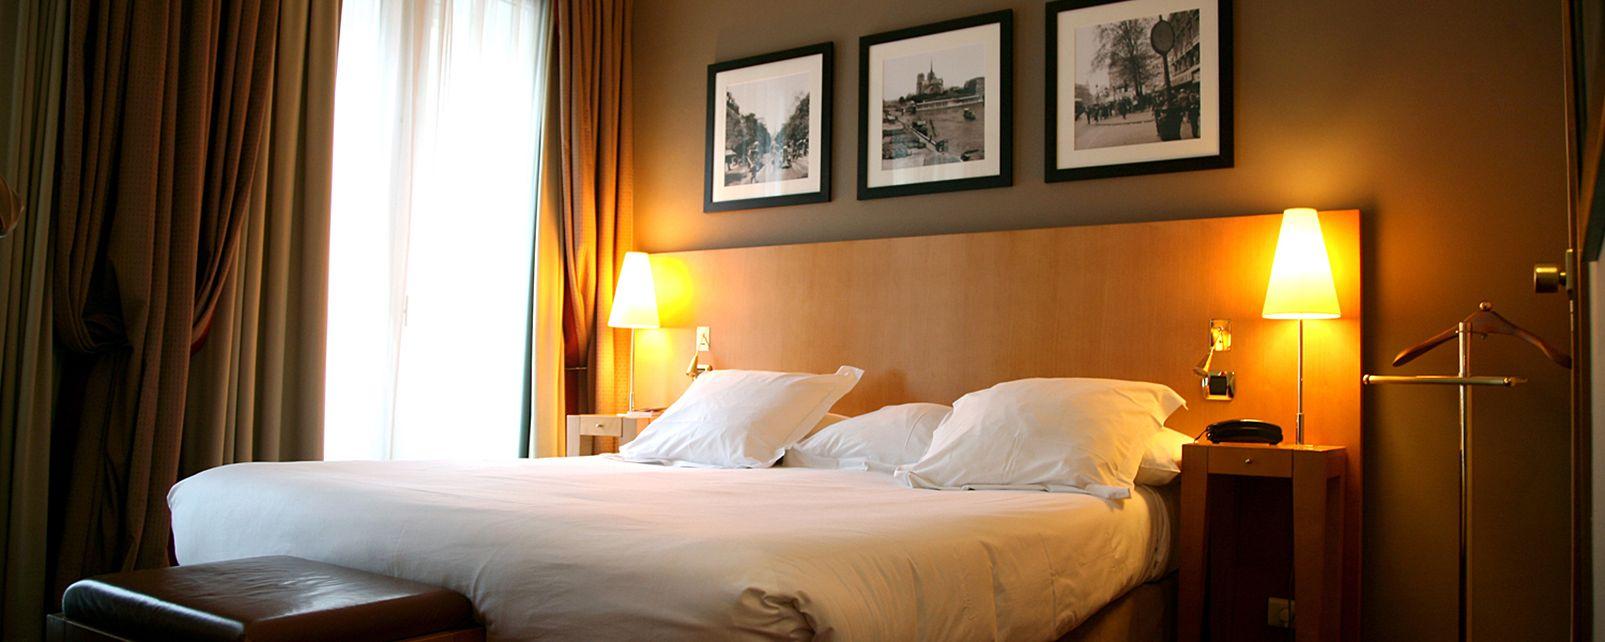 Hotel Best Western Premier Royal St Michel